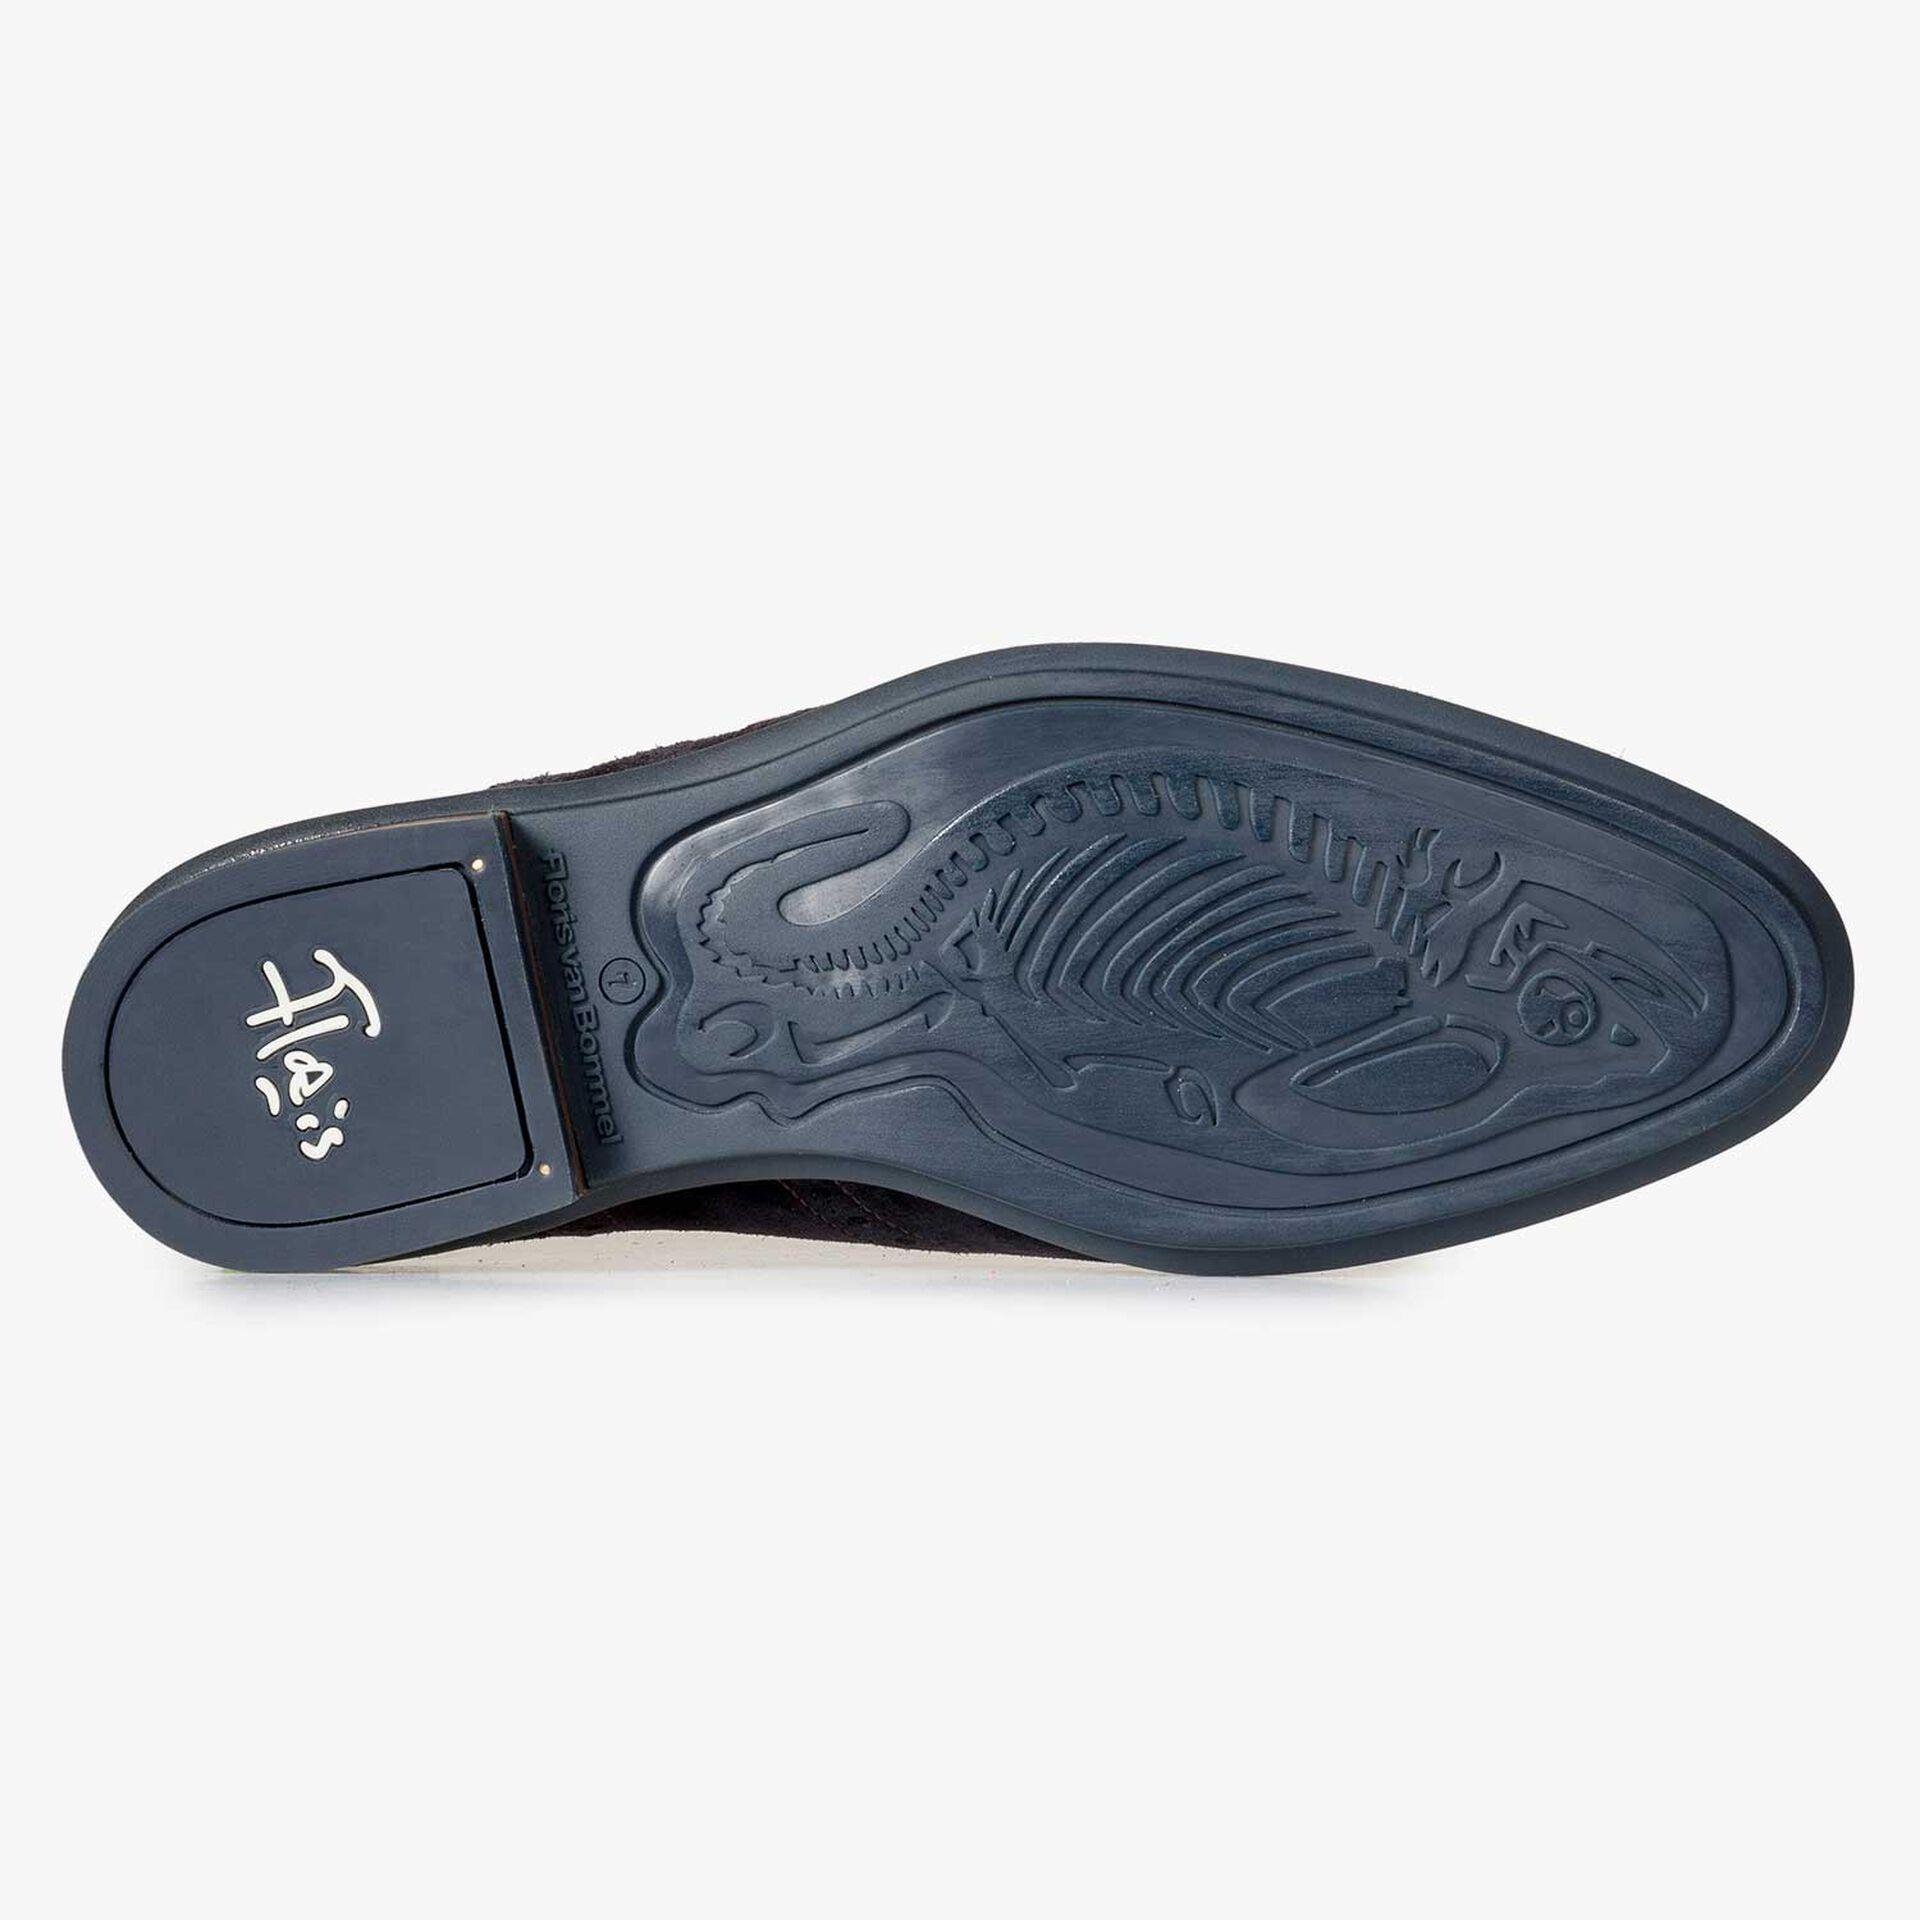 Blue brogue suede leather lace shoe